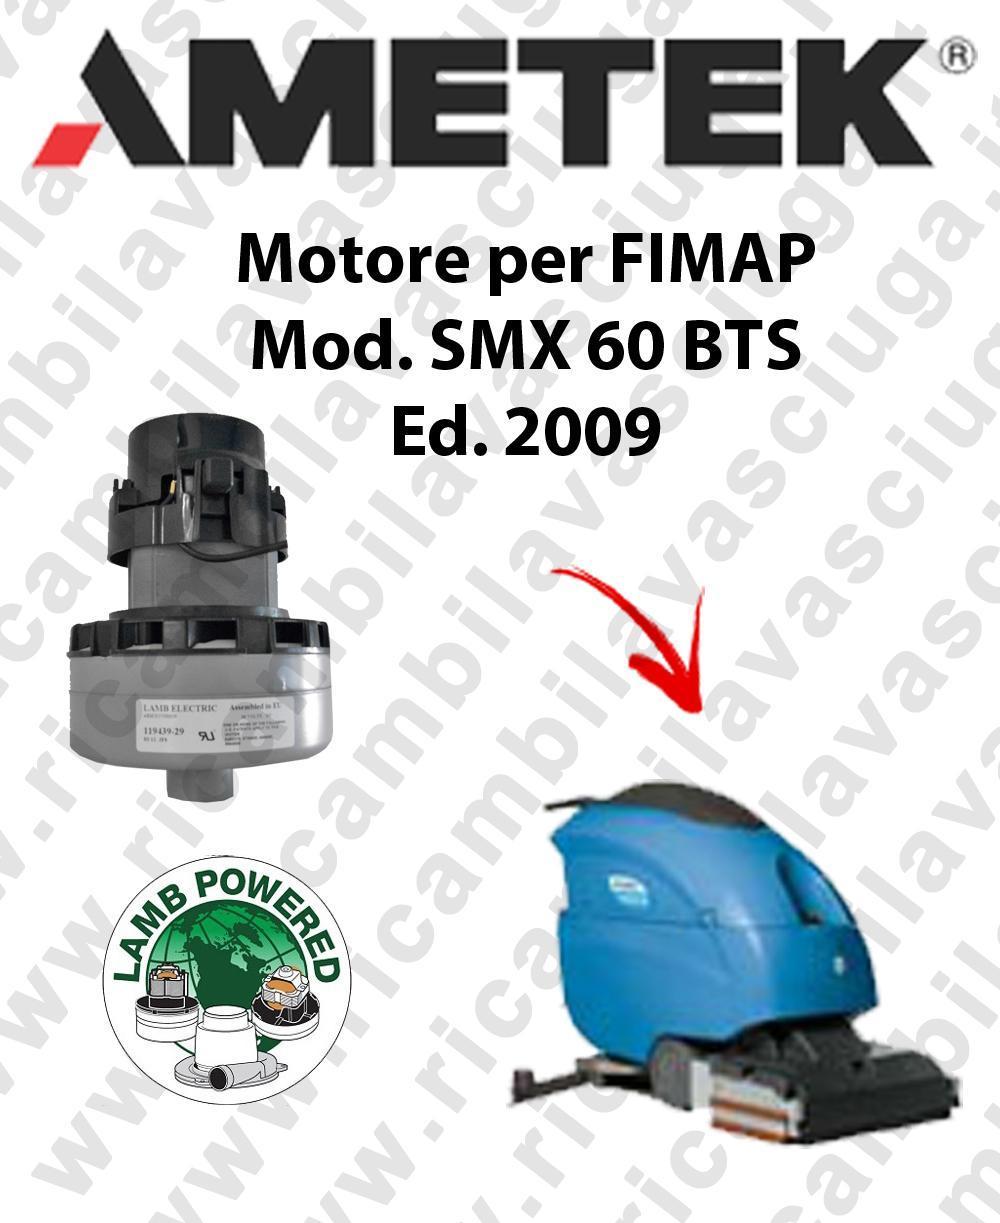 SMx 60 Bts   Vacuum motors AMETEK for scrubber dryer Fimap